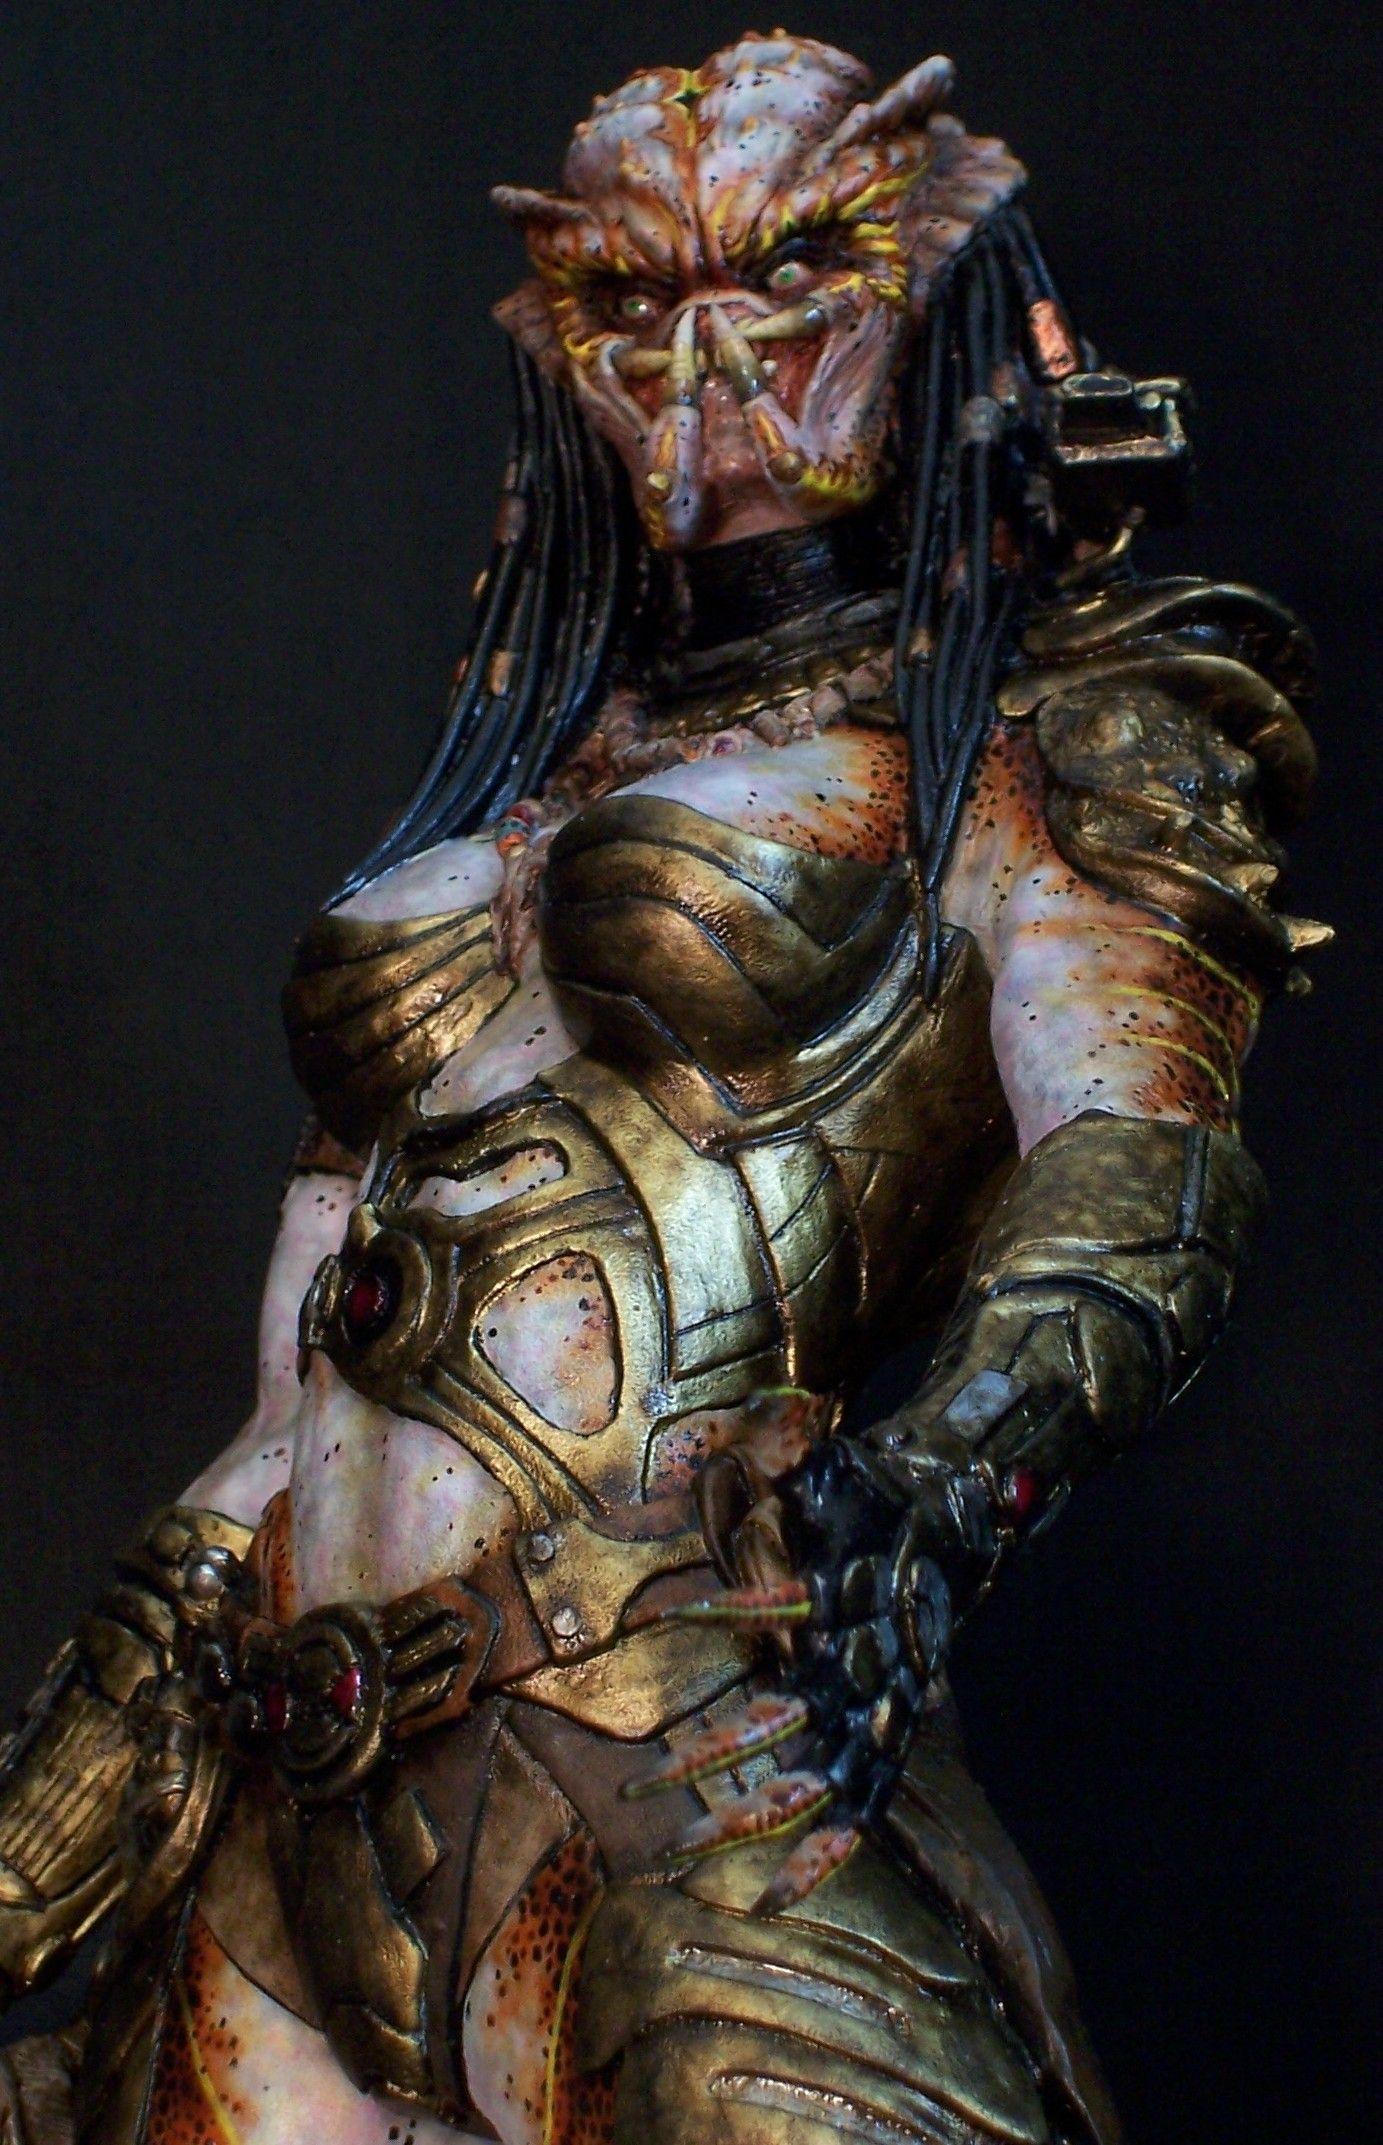 Female Predator Art Concepts   Predator Stuff Gallery   Creepy ...